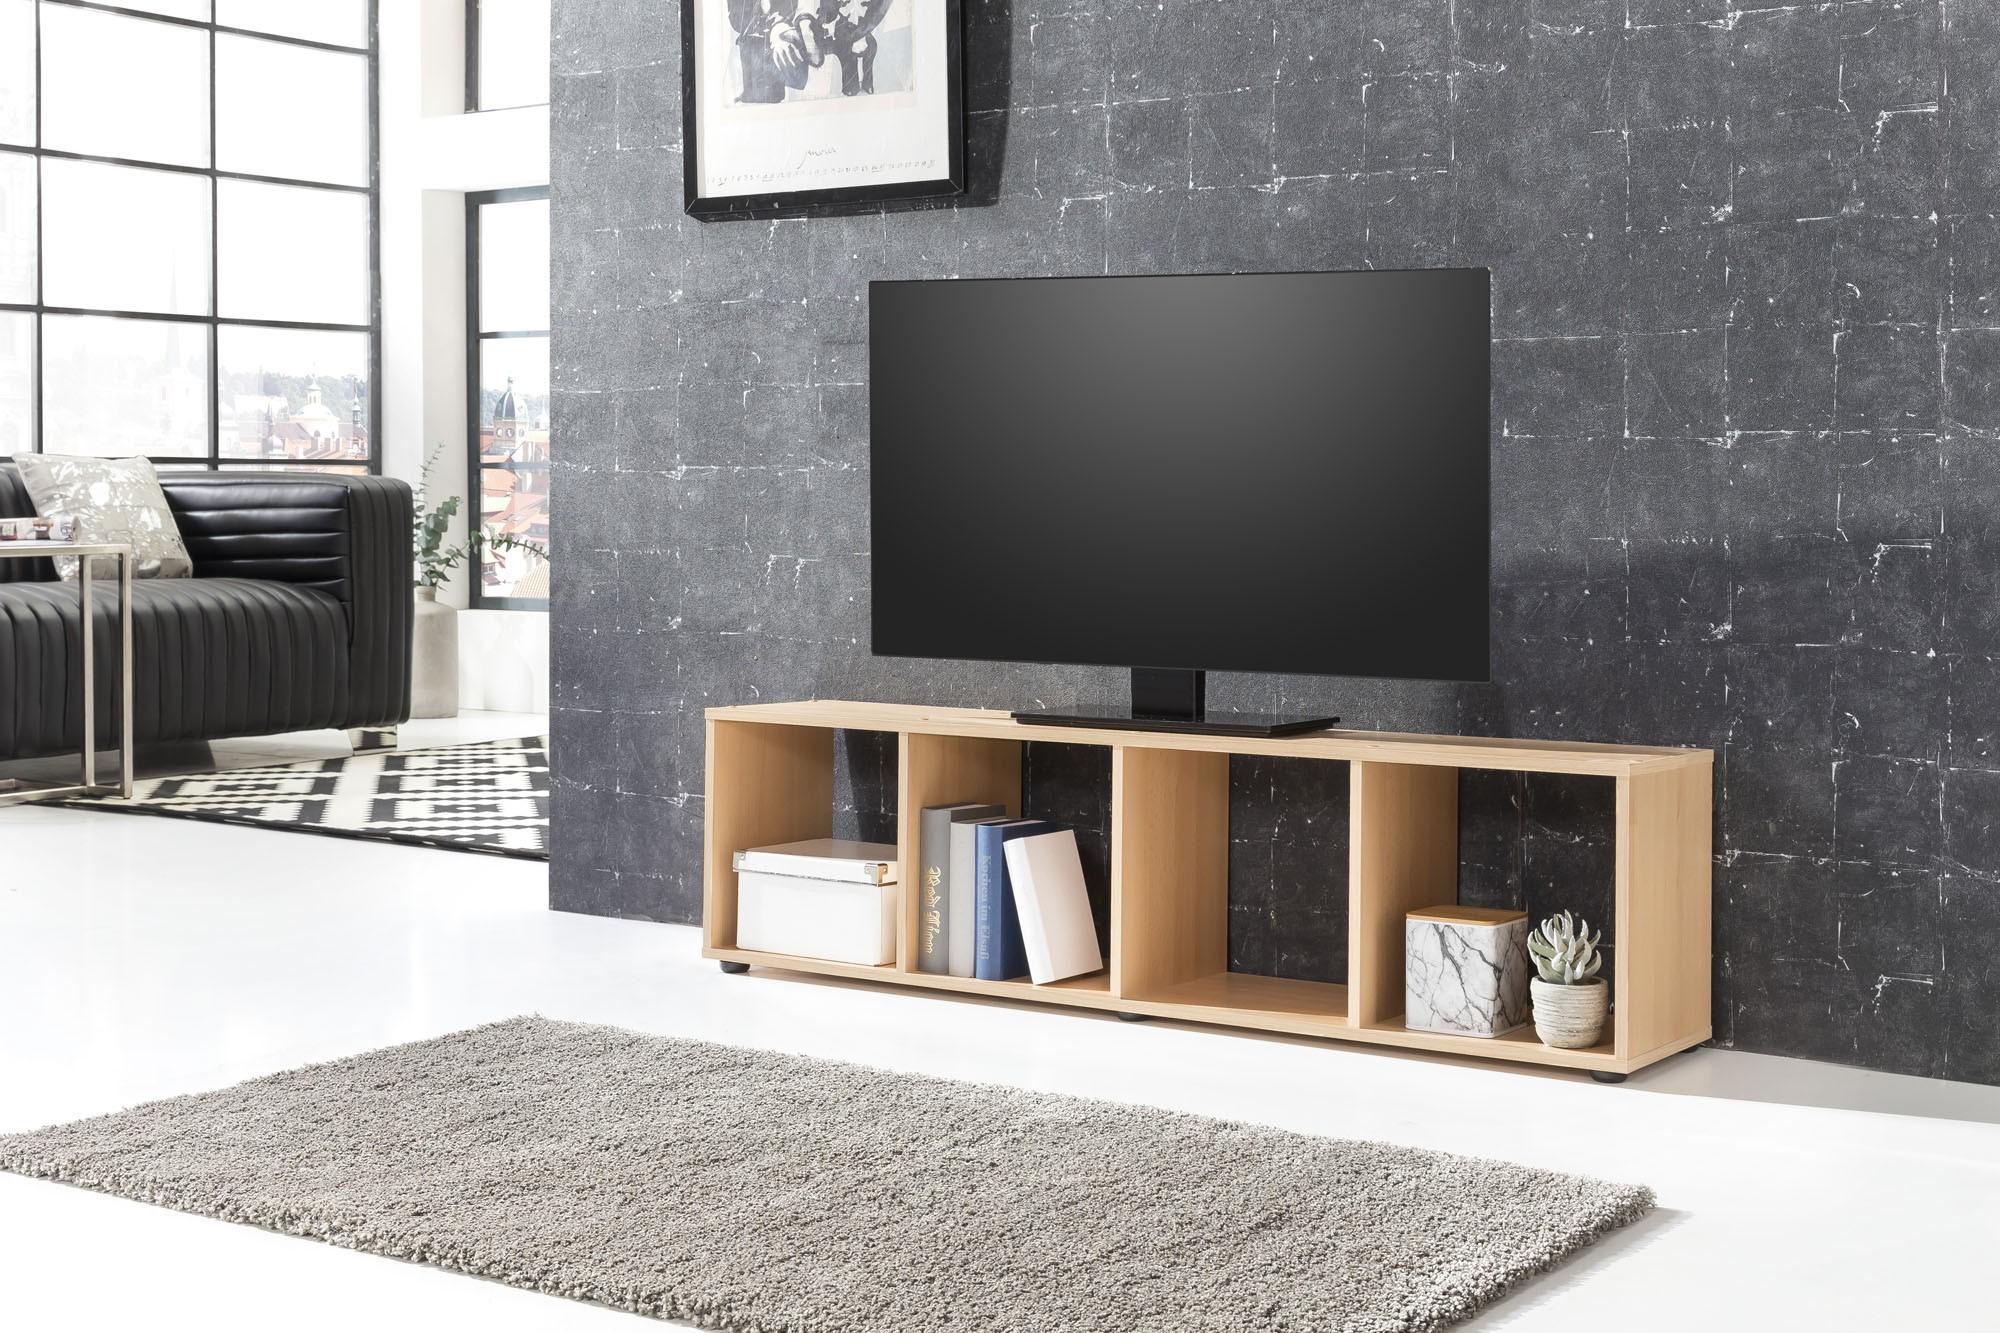 Buche Lowboard Amazing Lowboard Buche Tv Catuella In